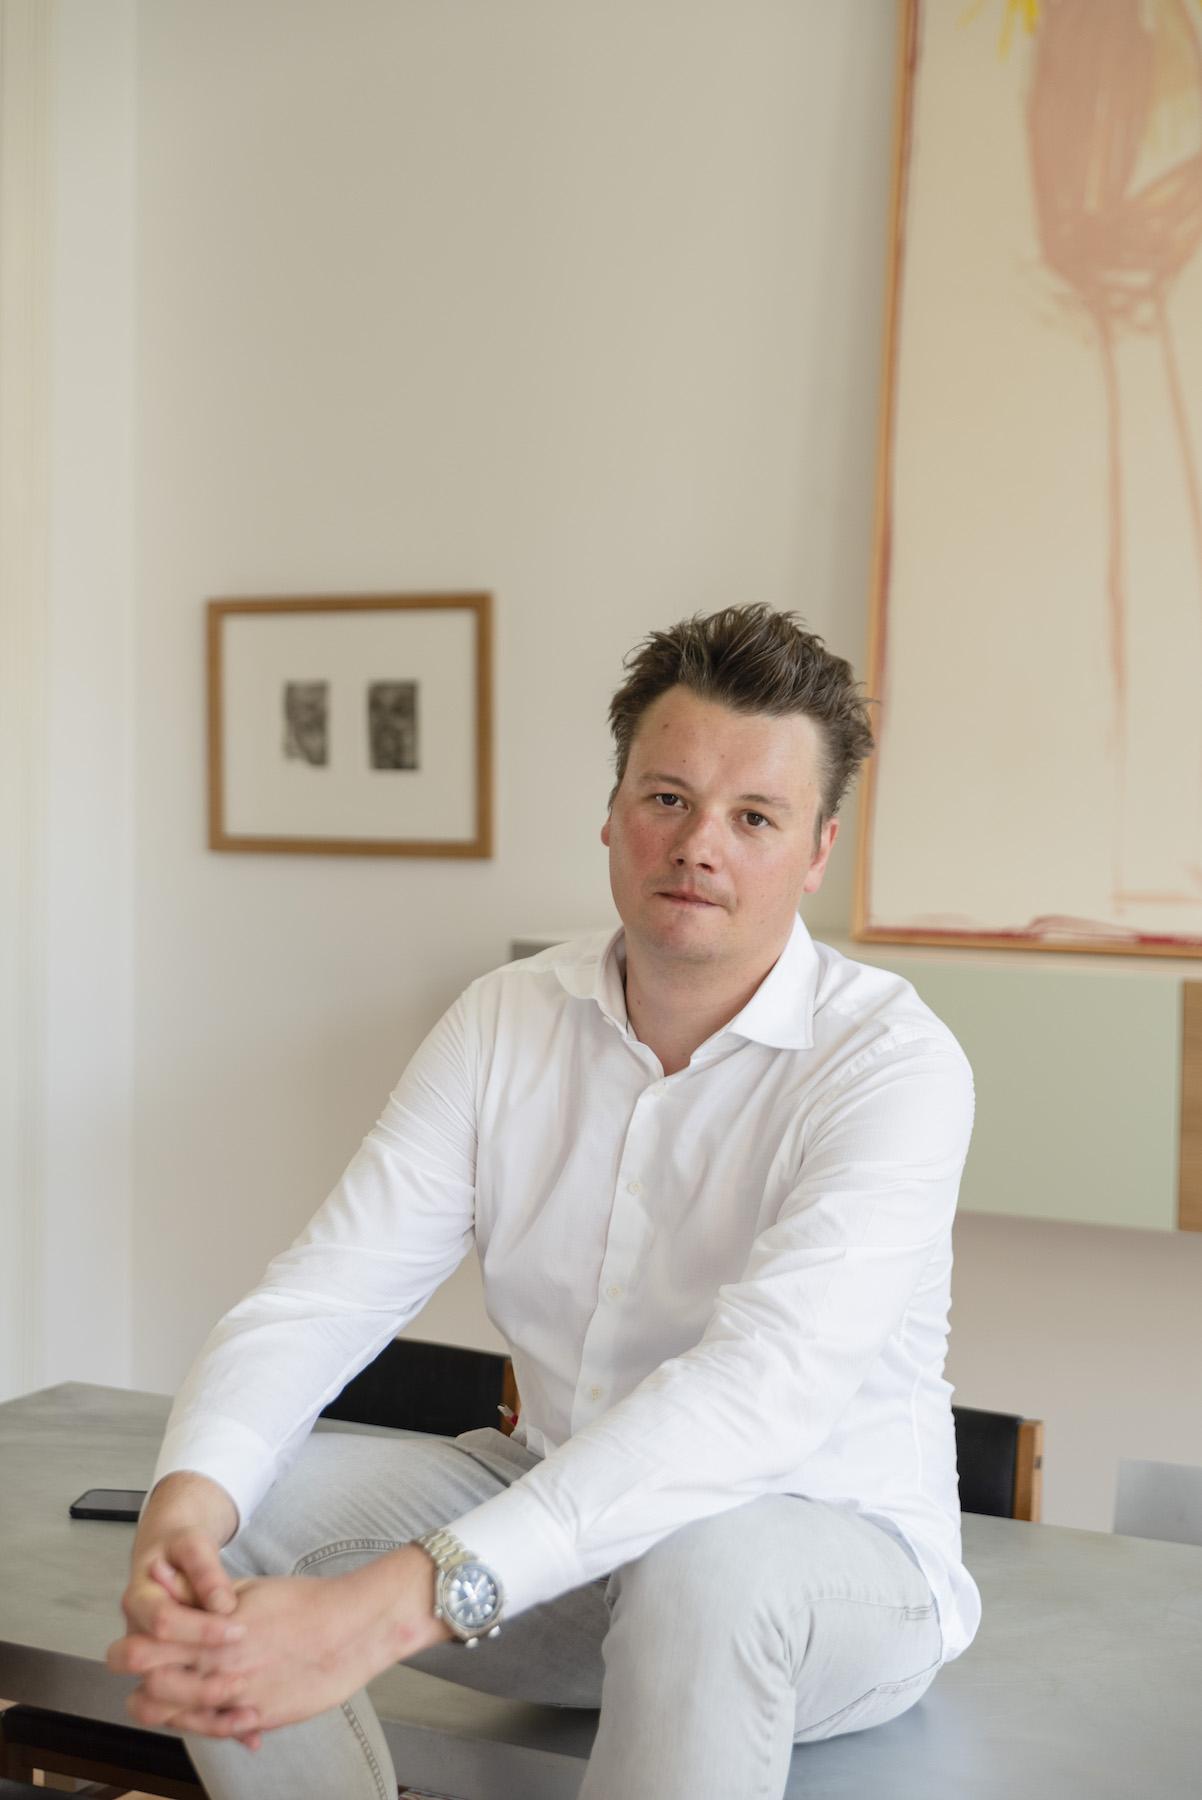 Joris Beernaert sitting in front of work by Fabrice Samyn. Photo: Alexandra Bertels. Courtesy of Joris Beernaert.